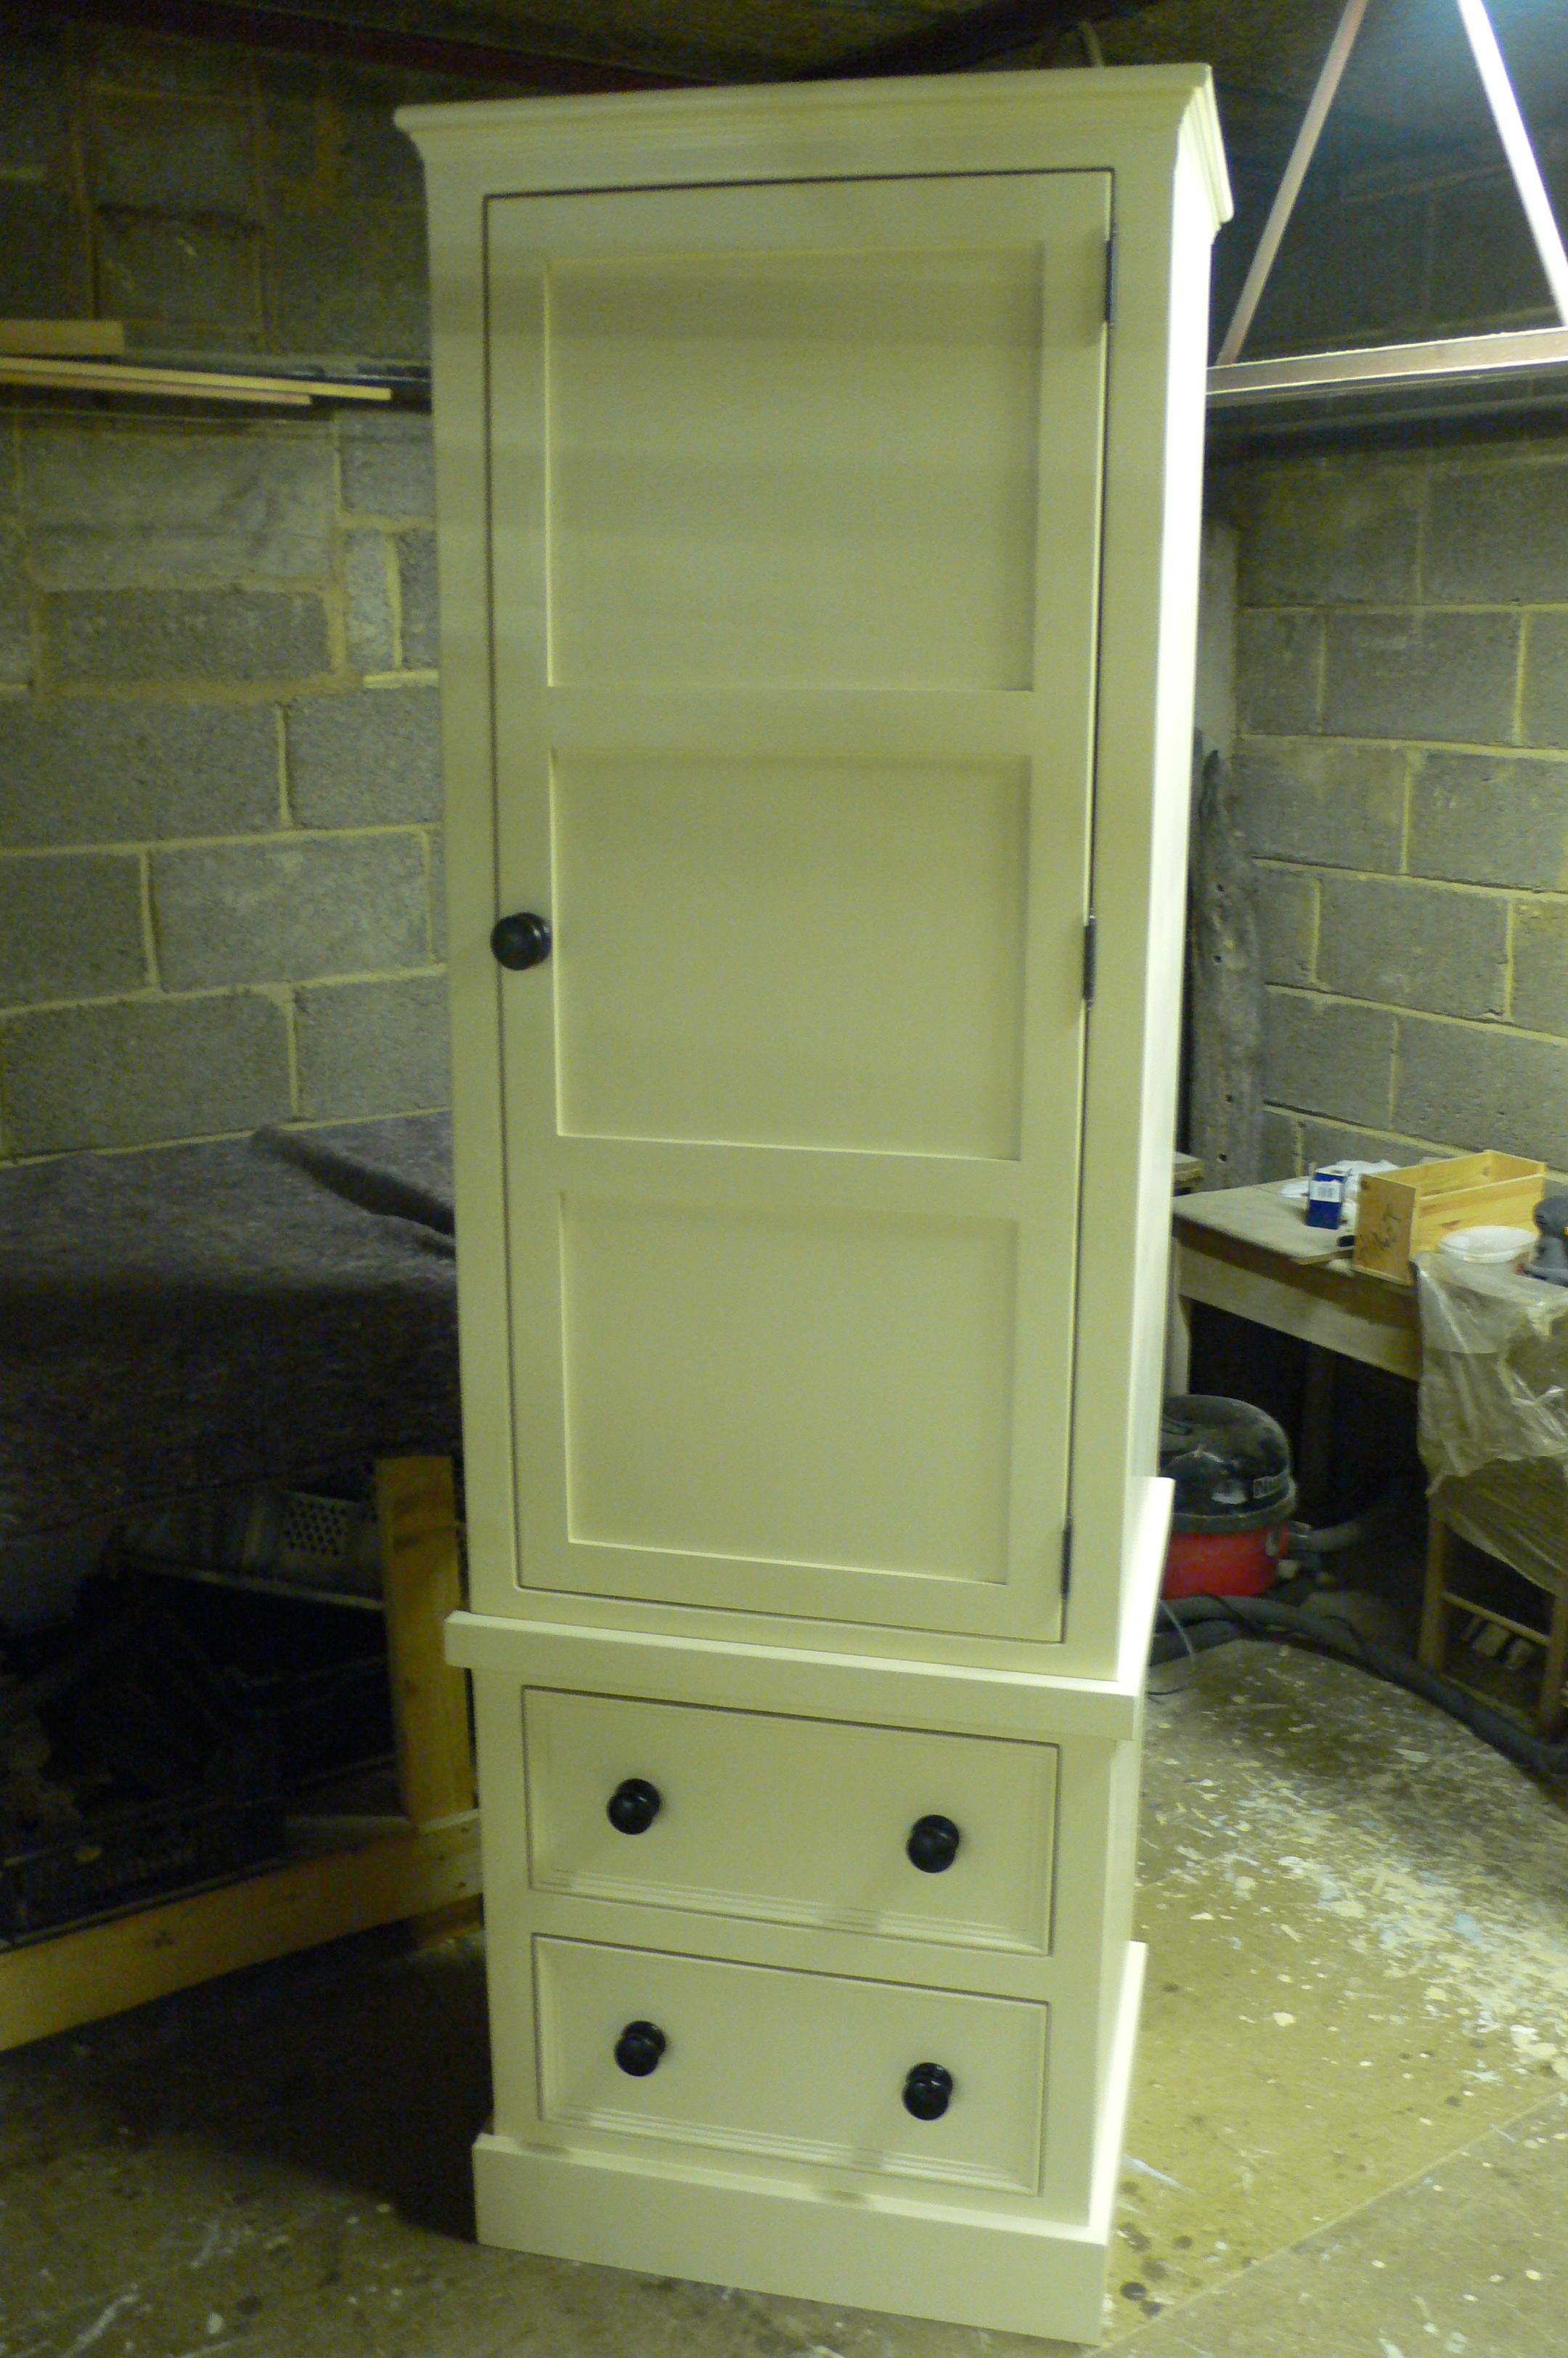 Slim Pantry Cupboard The Olive Branch Ltd The Olive Branch Kitchens Ltd